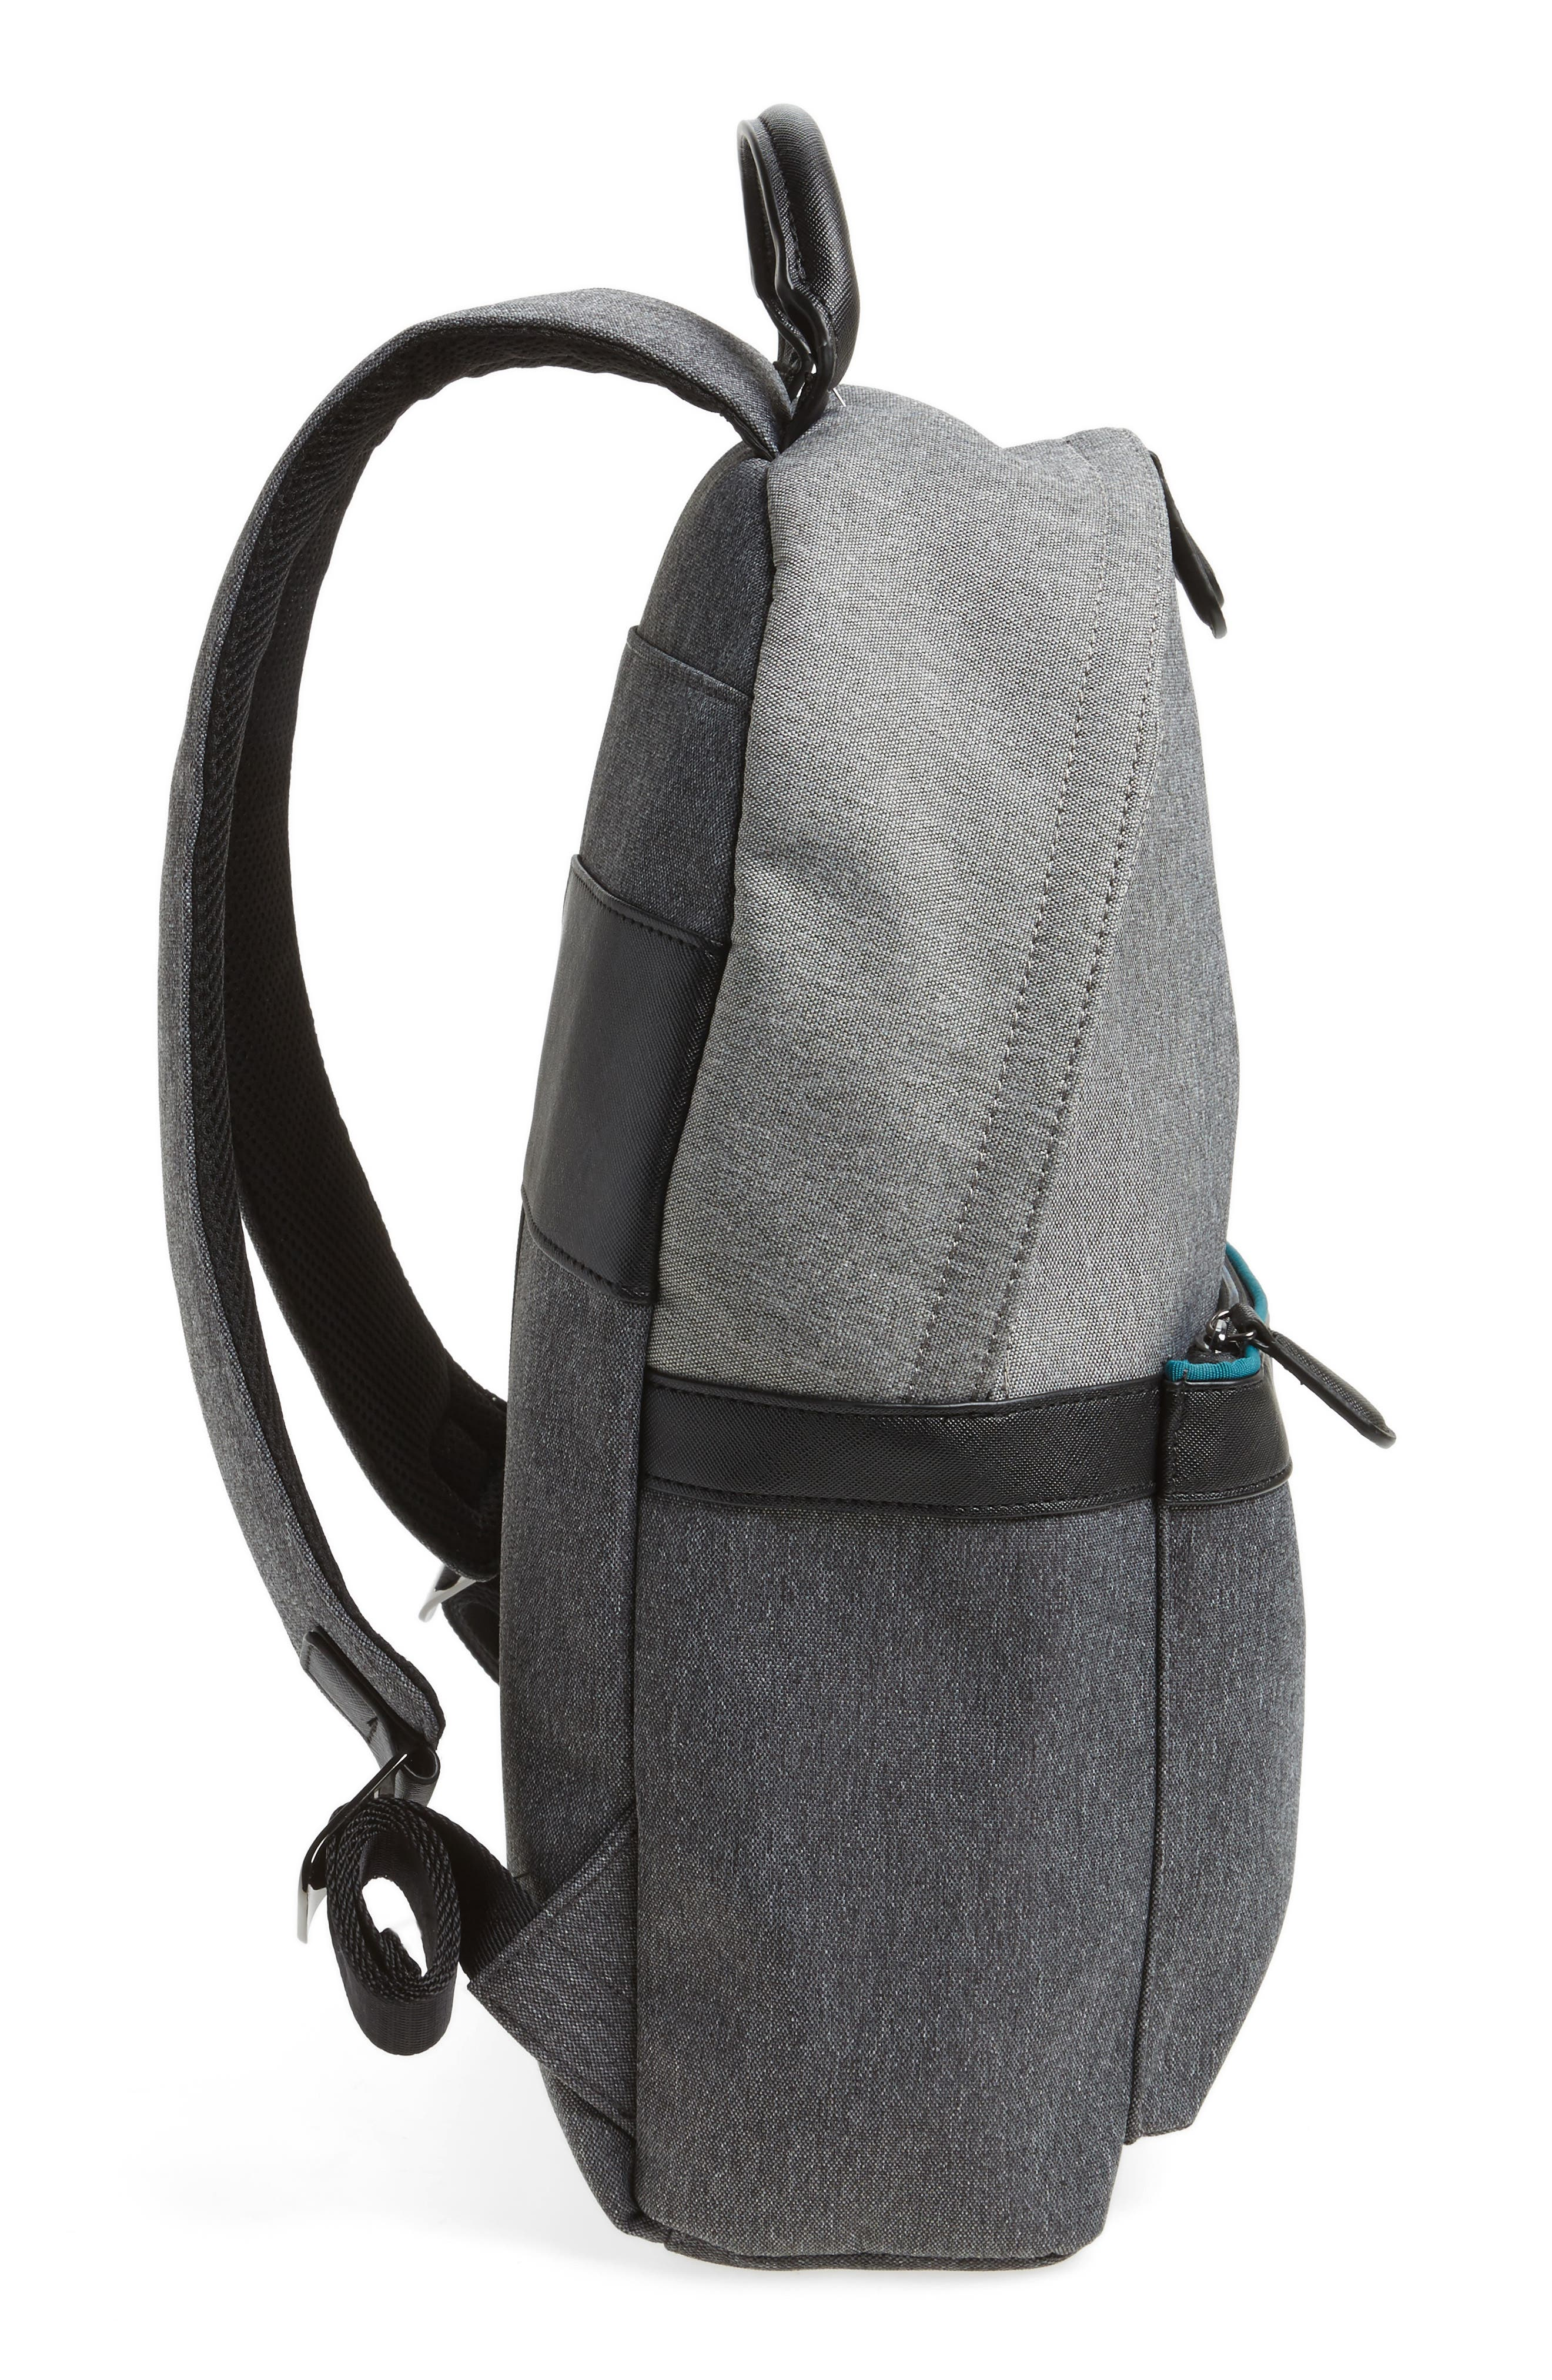 Zirabi Backpack,                             Alternate thumbnail 5, color,                             030